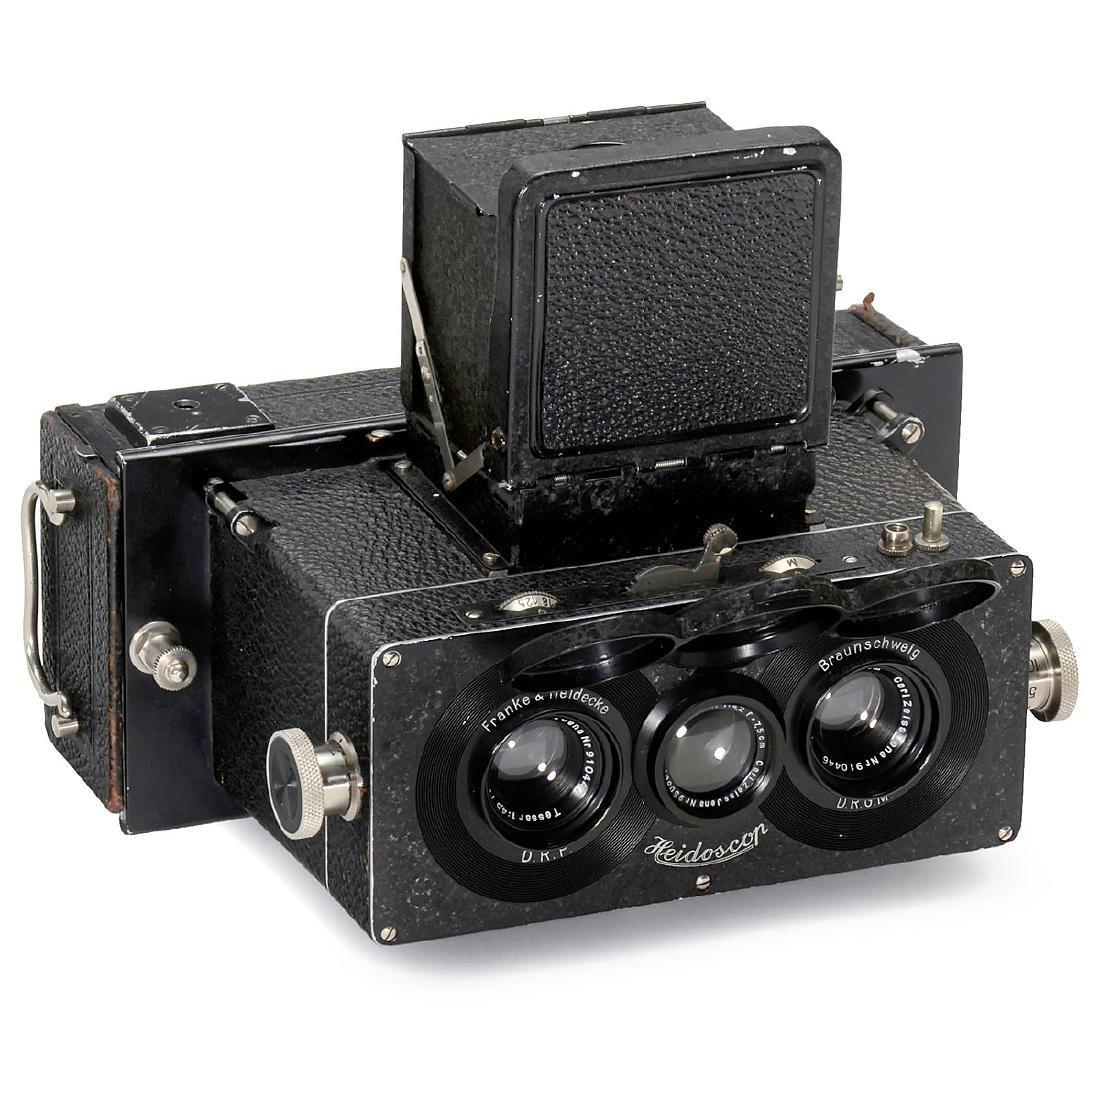 Heidoscop 6x13, Fourth Model, 1931